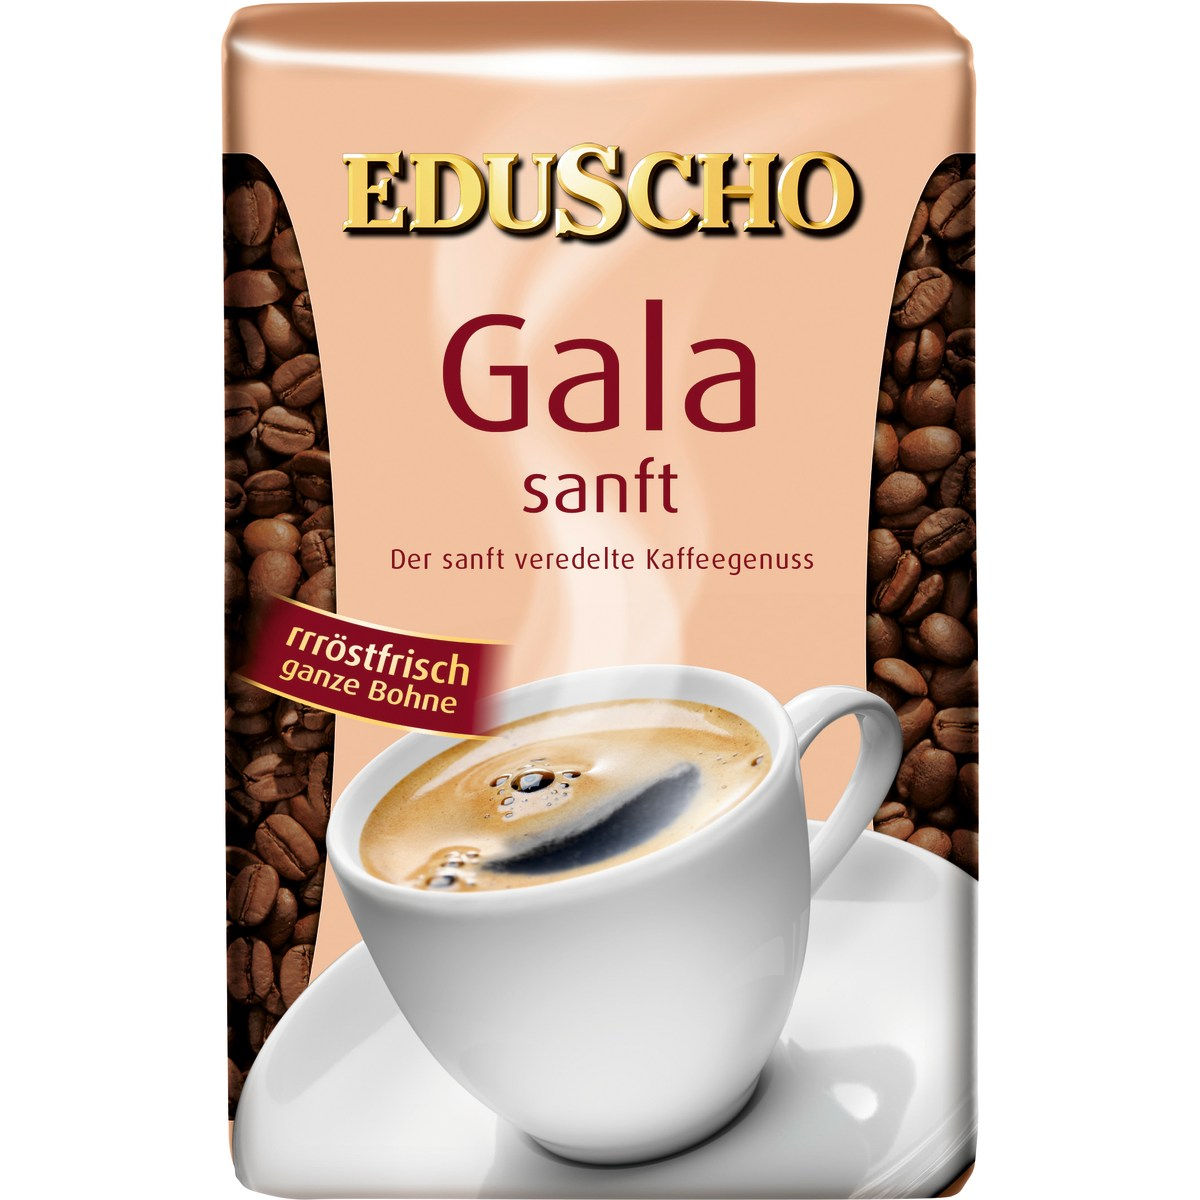 Eduscho Gala Sanft Bohne